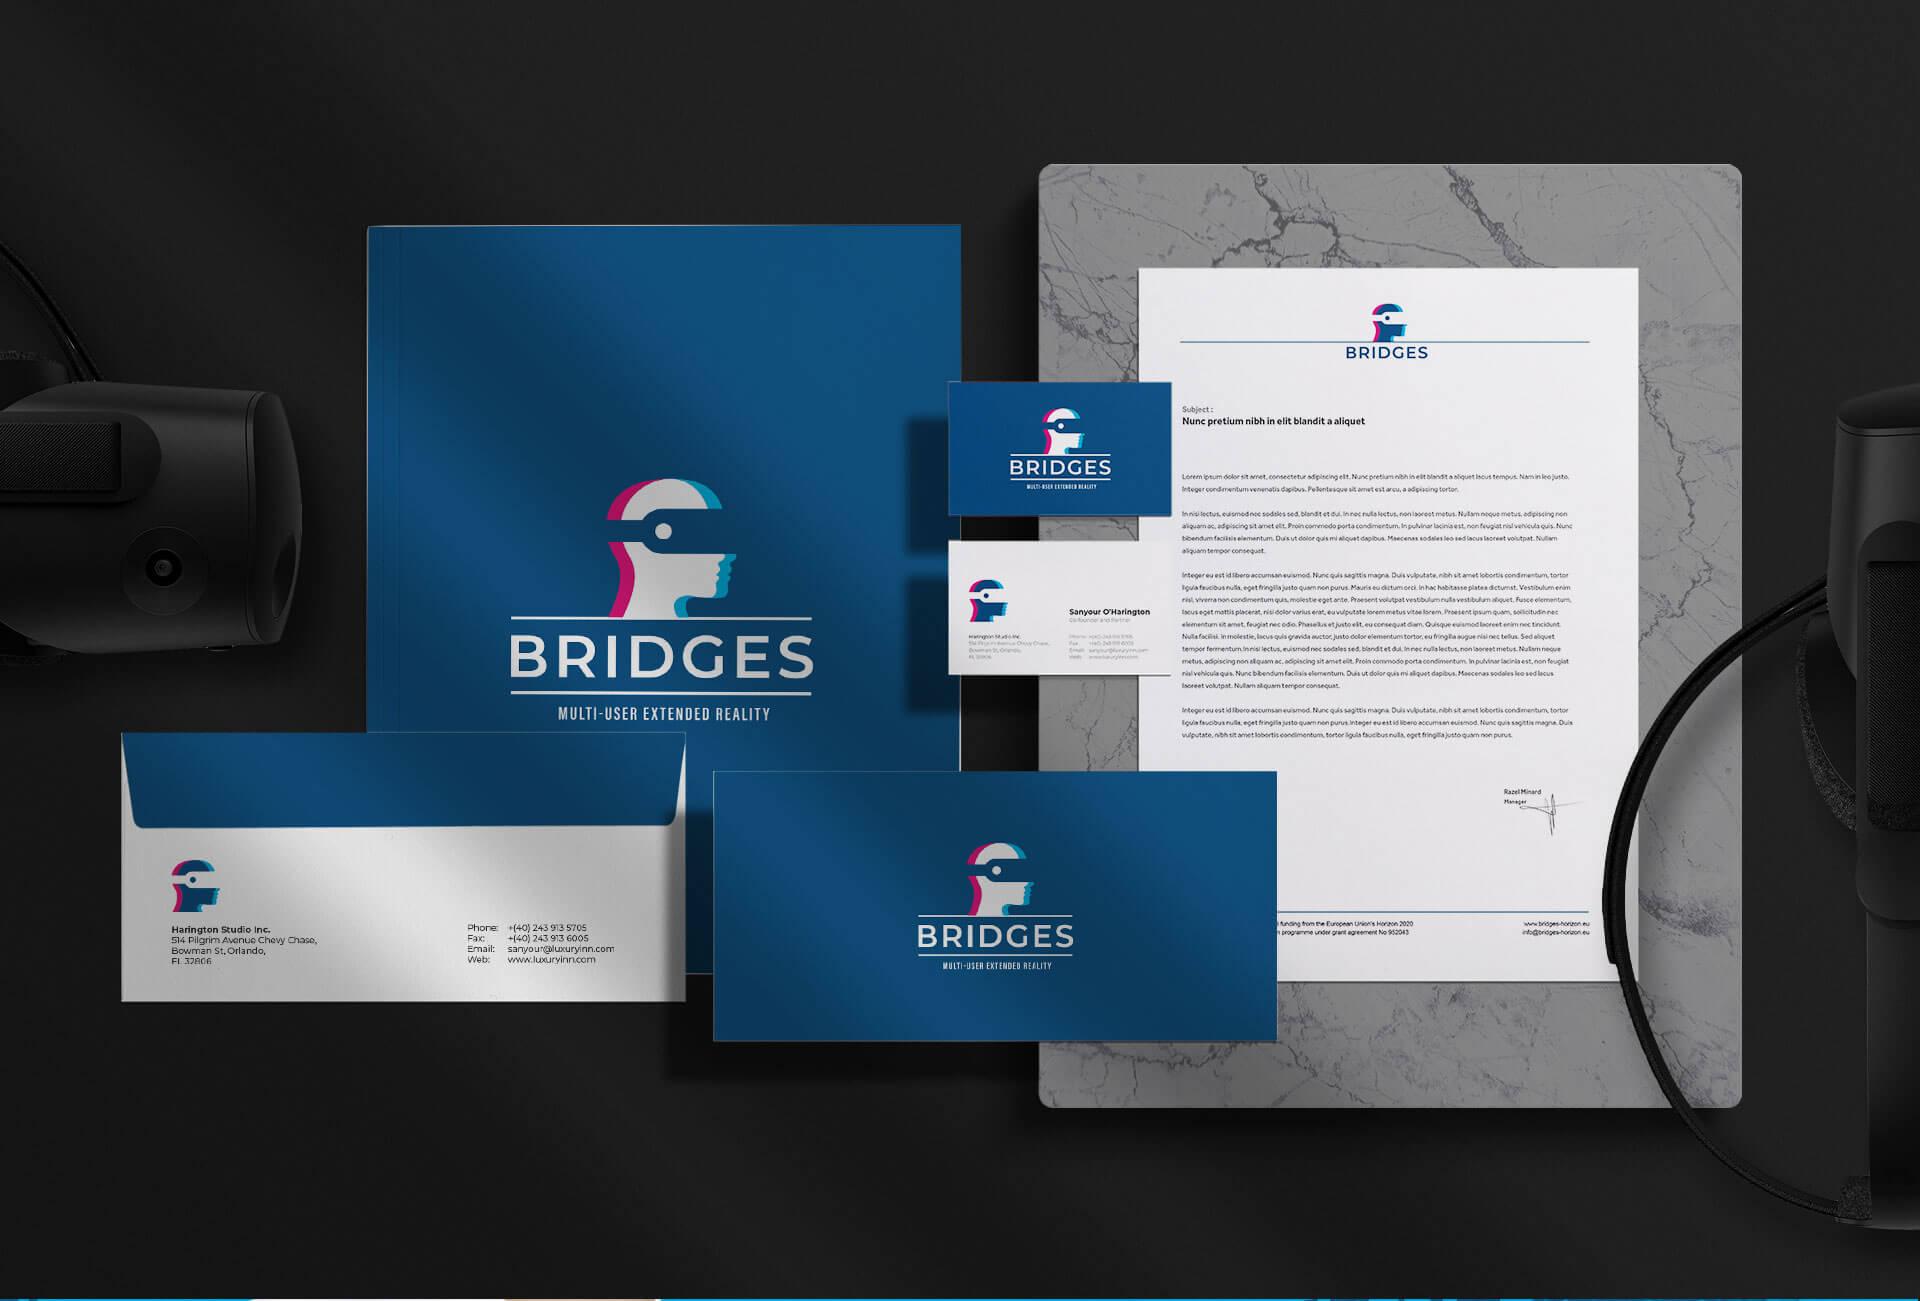 zerouno-design-Bridges-website5